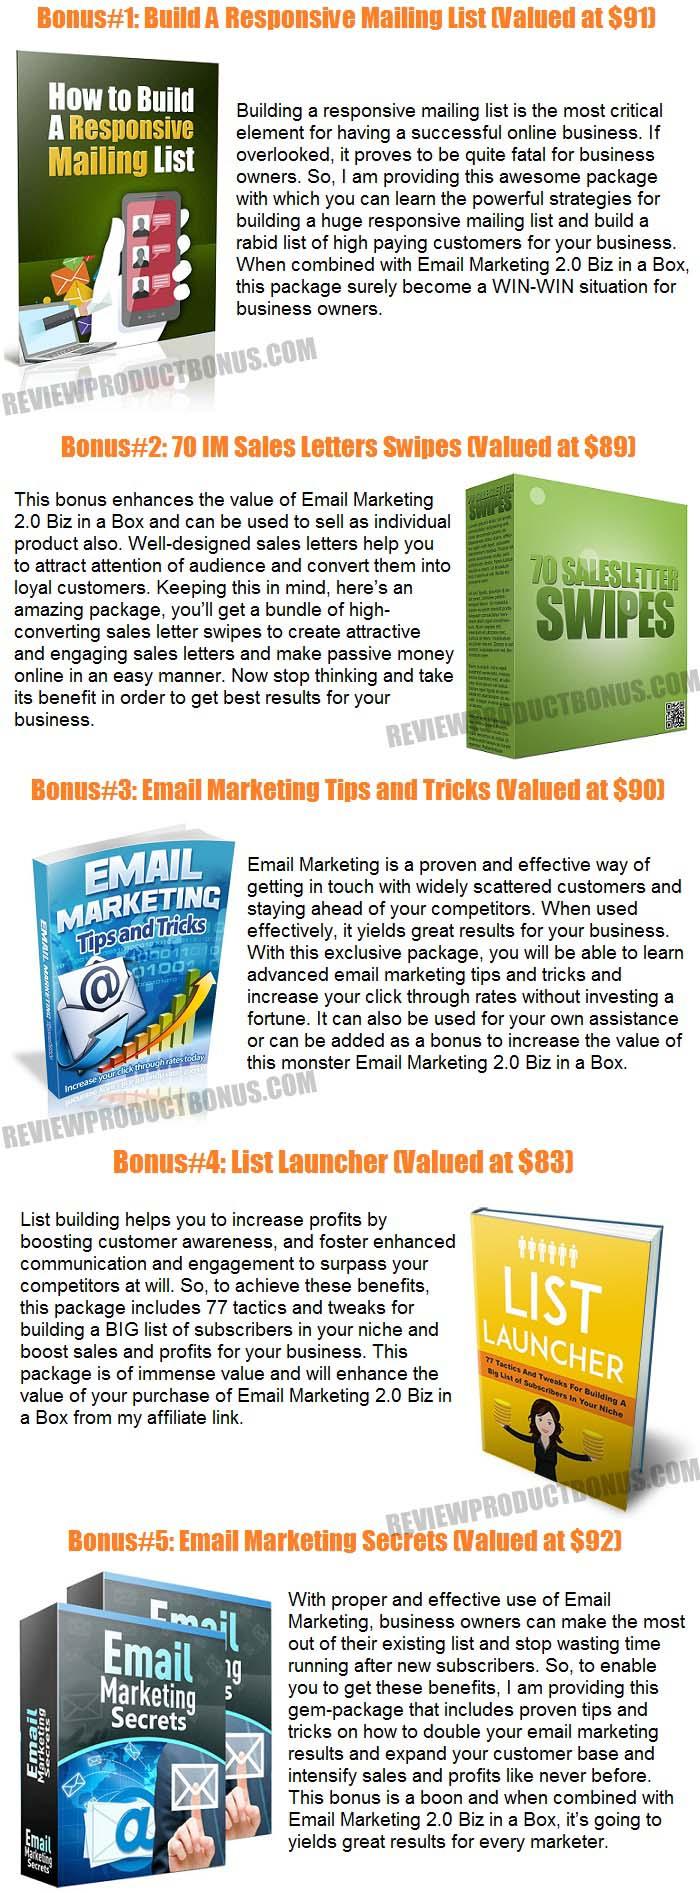 Email Marketing 2.0 Biz in a Box Bonus